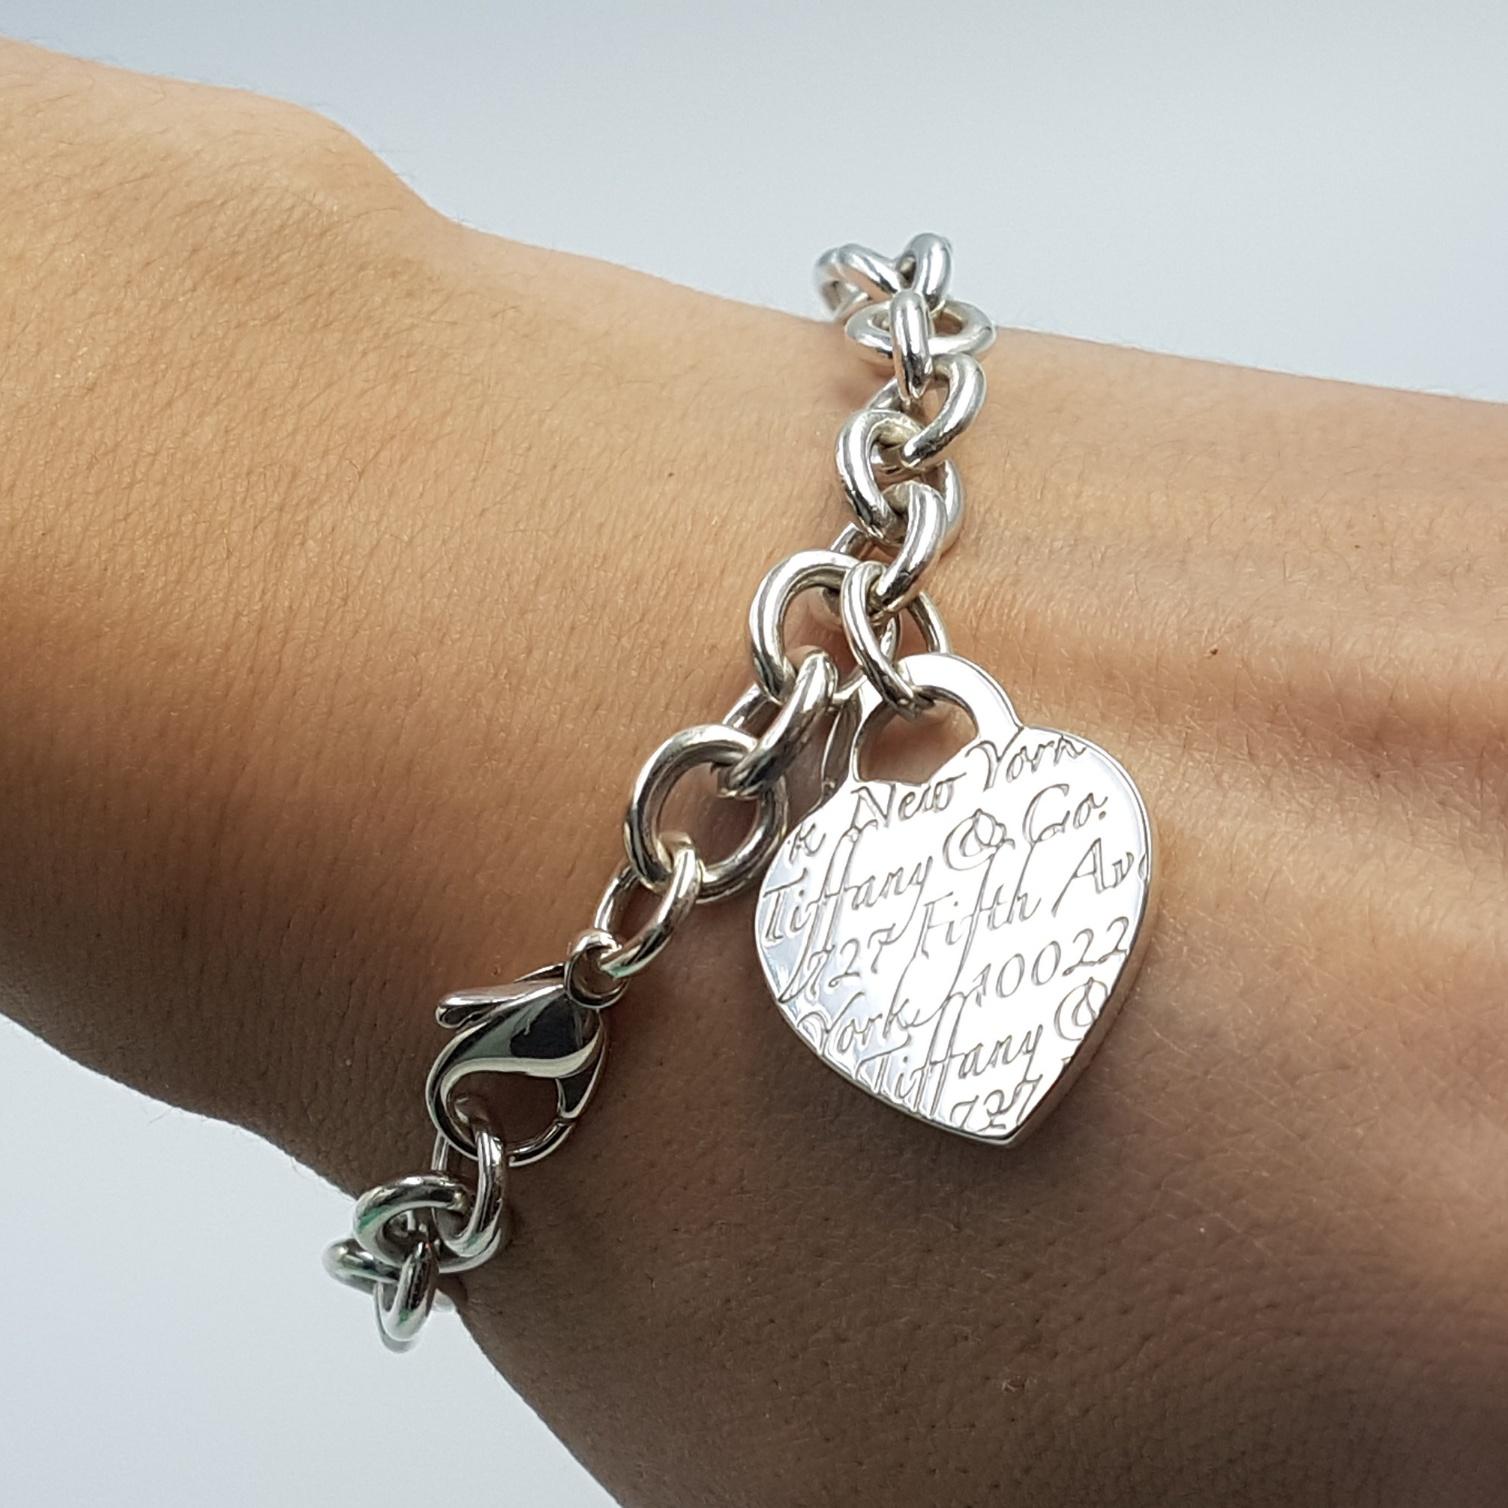 "Tiffany Heart Bracelet >> Tiffany & Co 5th Avenue New York Notes Heart Charm Bracelet 8"" ⋆ SmartShop Jewelry"